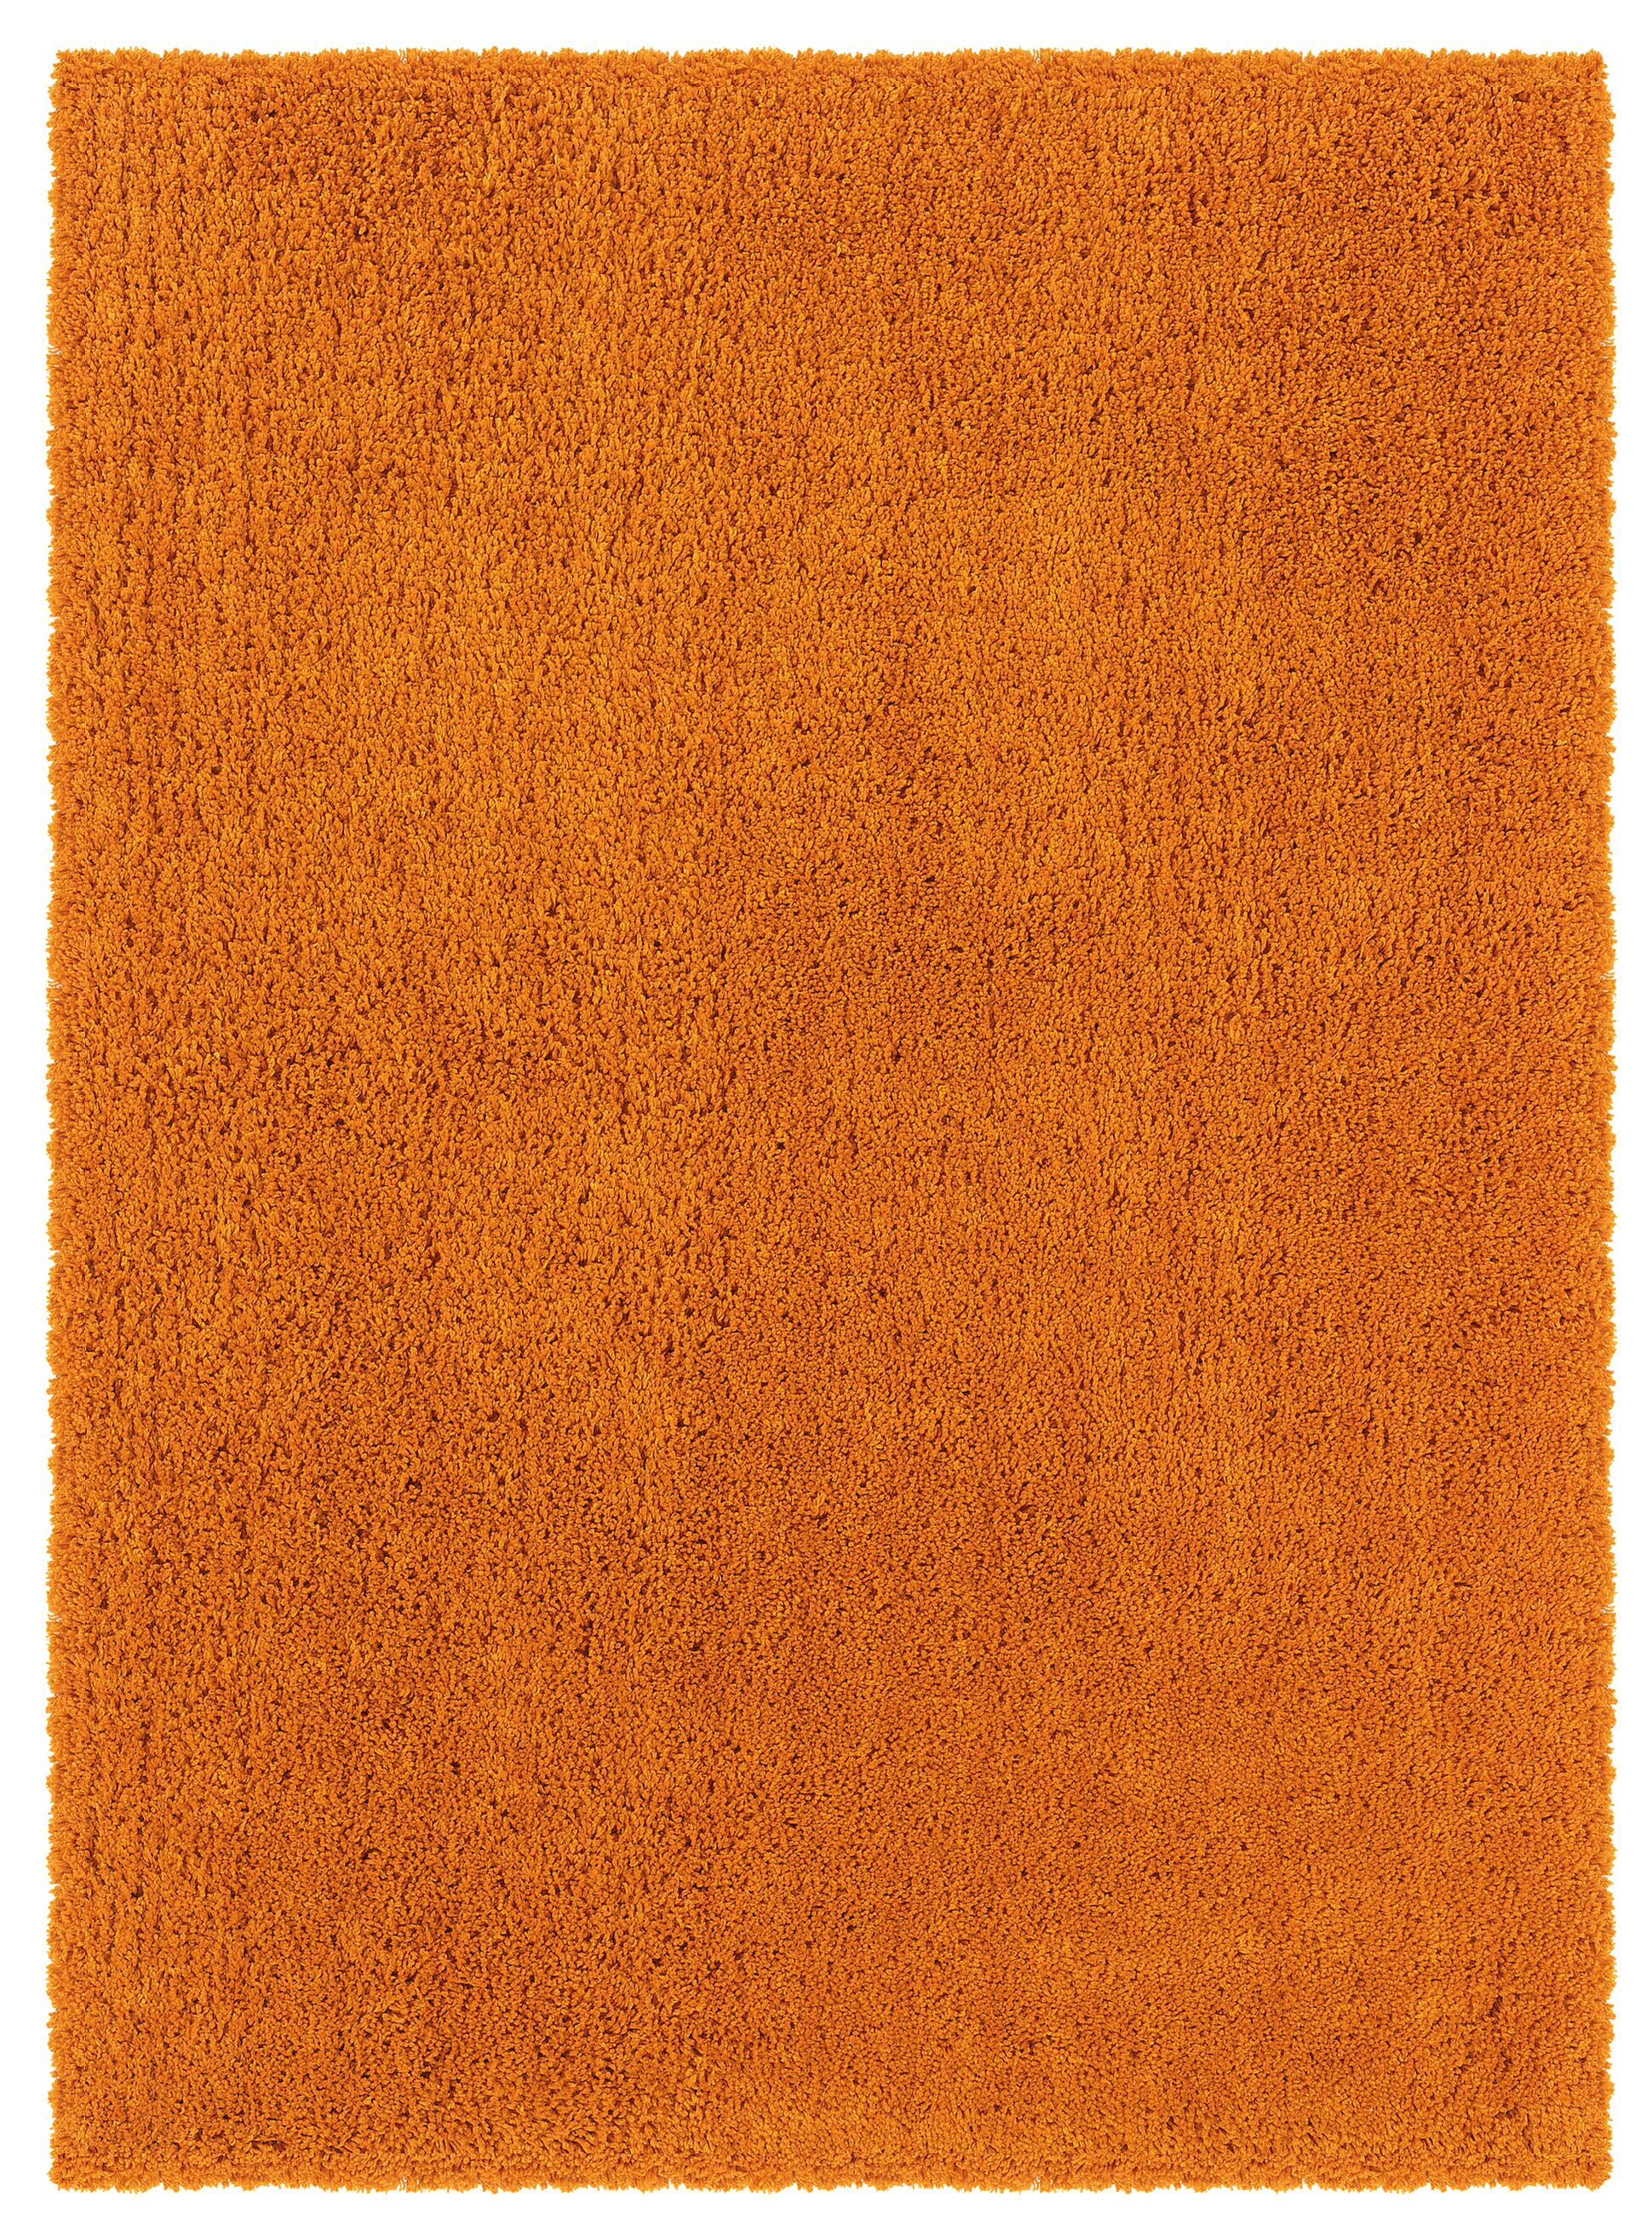 Hand-Woven Beeswax Area Rug Rug Size: Rectangle 8' x 10'